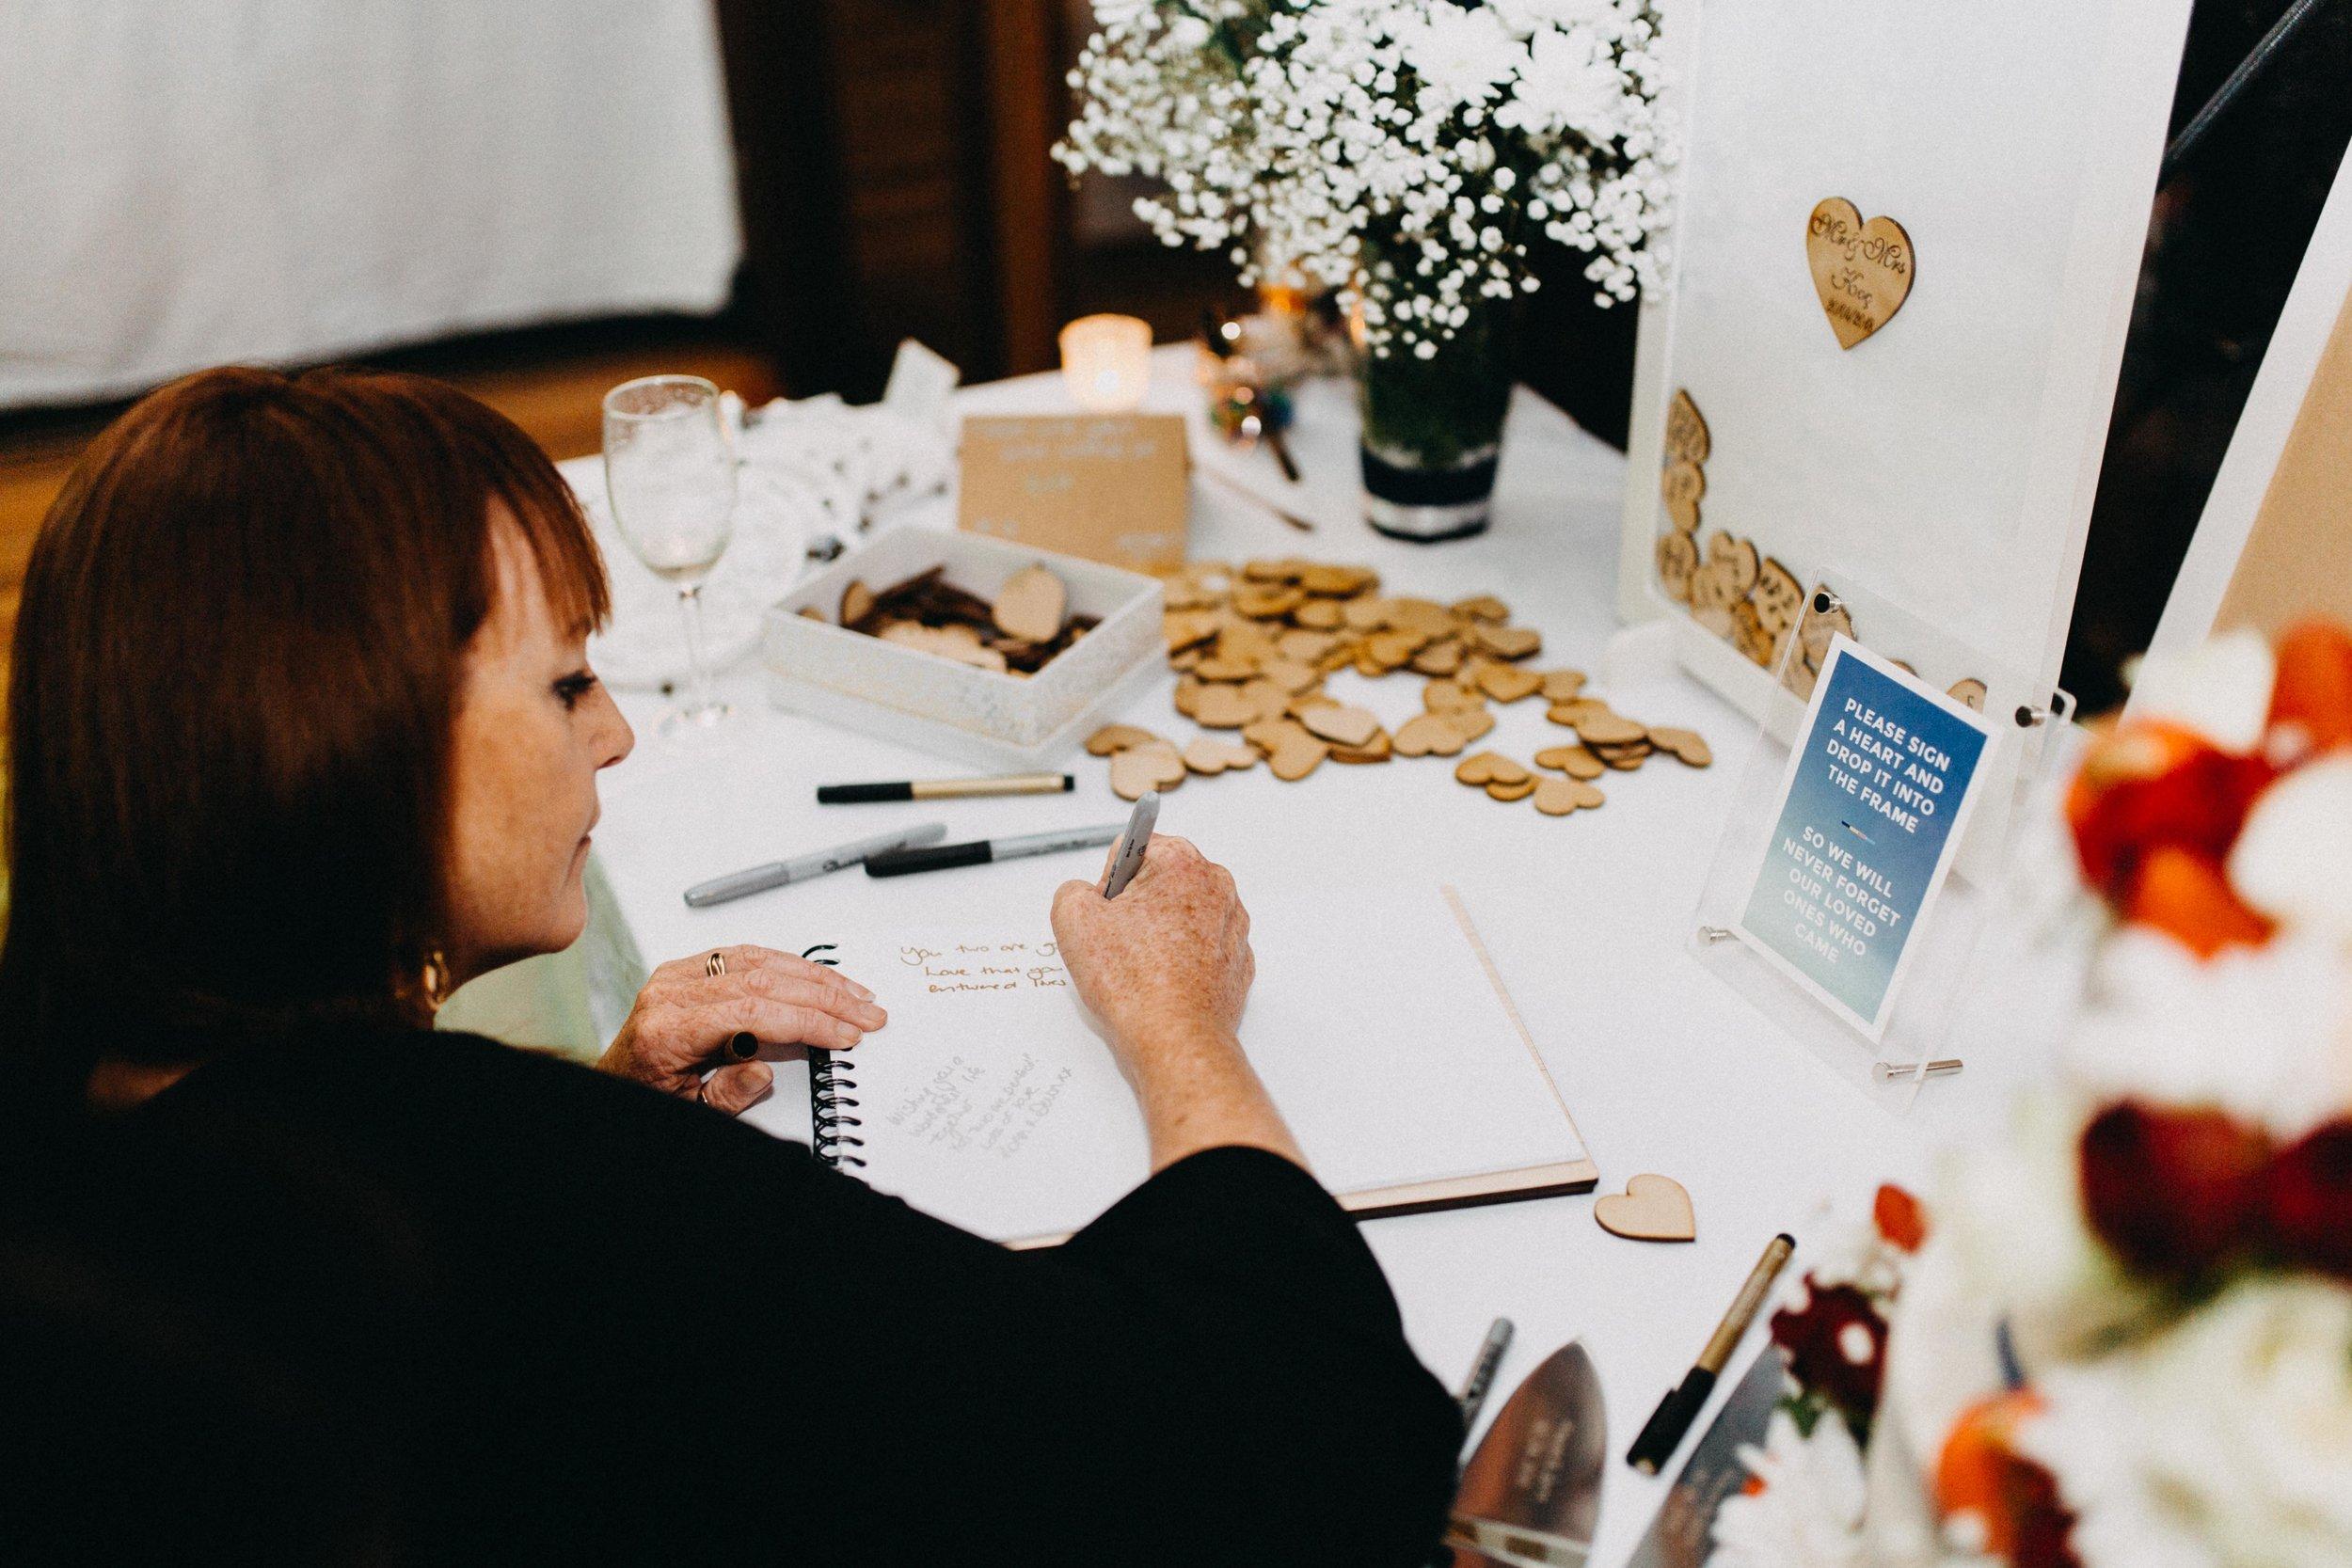 cabarita-park-sydney-wedding-emilyobrienphotography.net-71.jpg